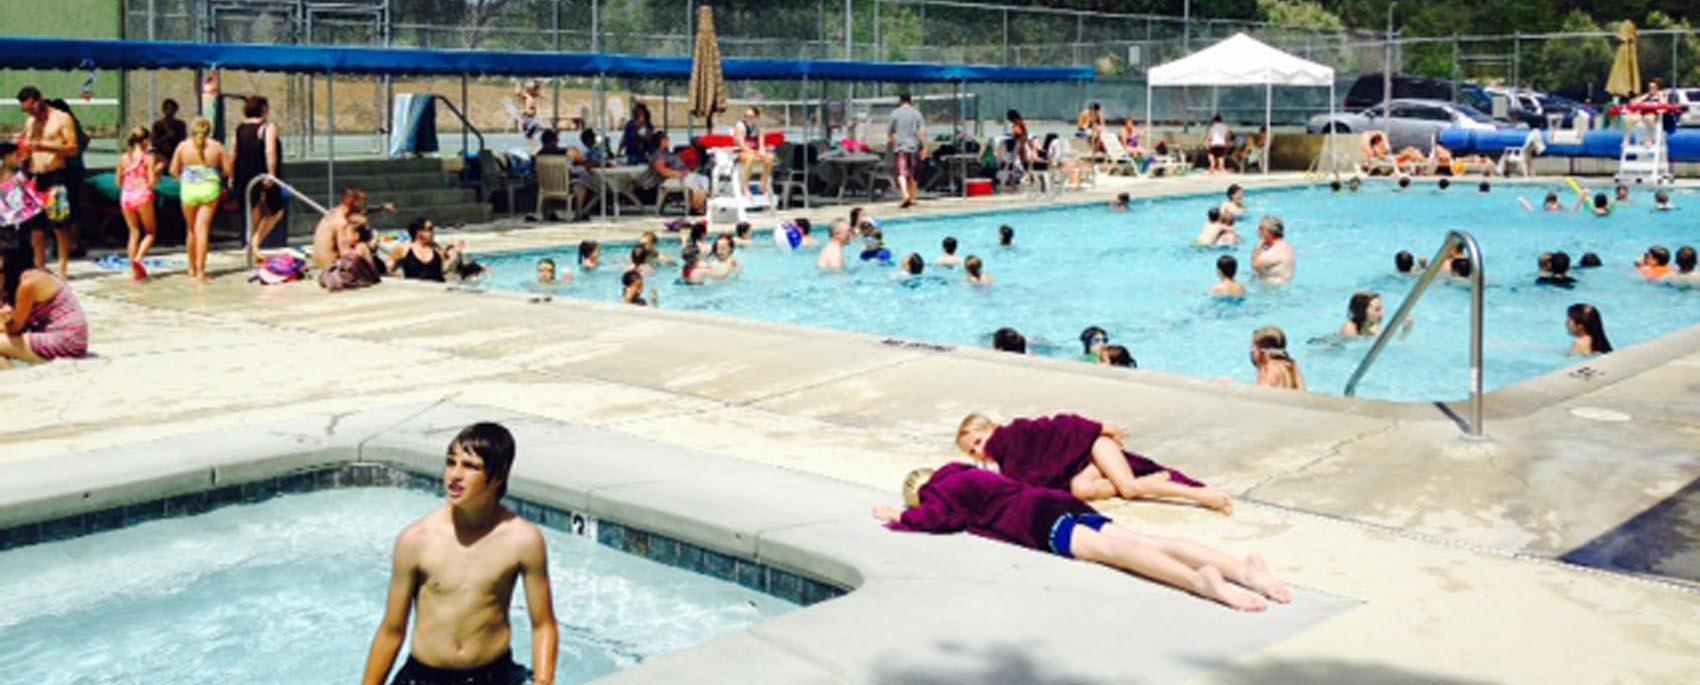 yloa-pool-full-crowd